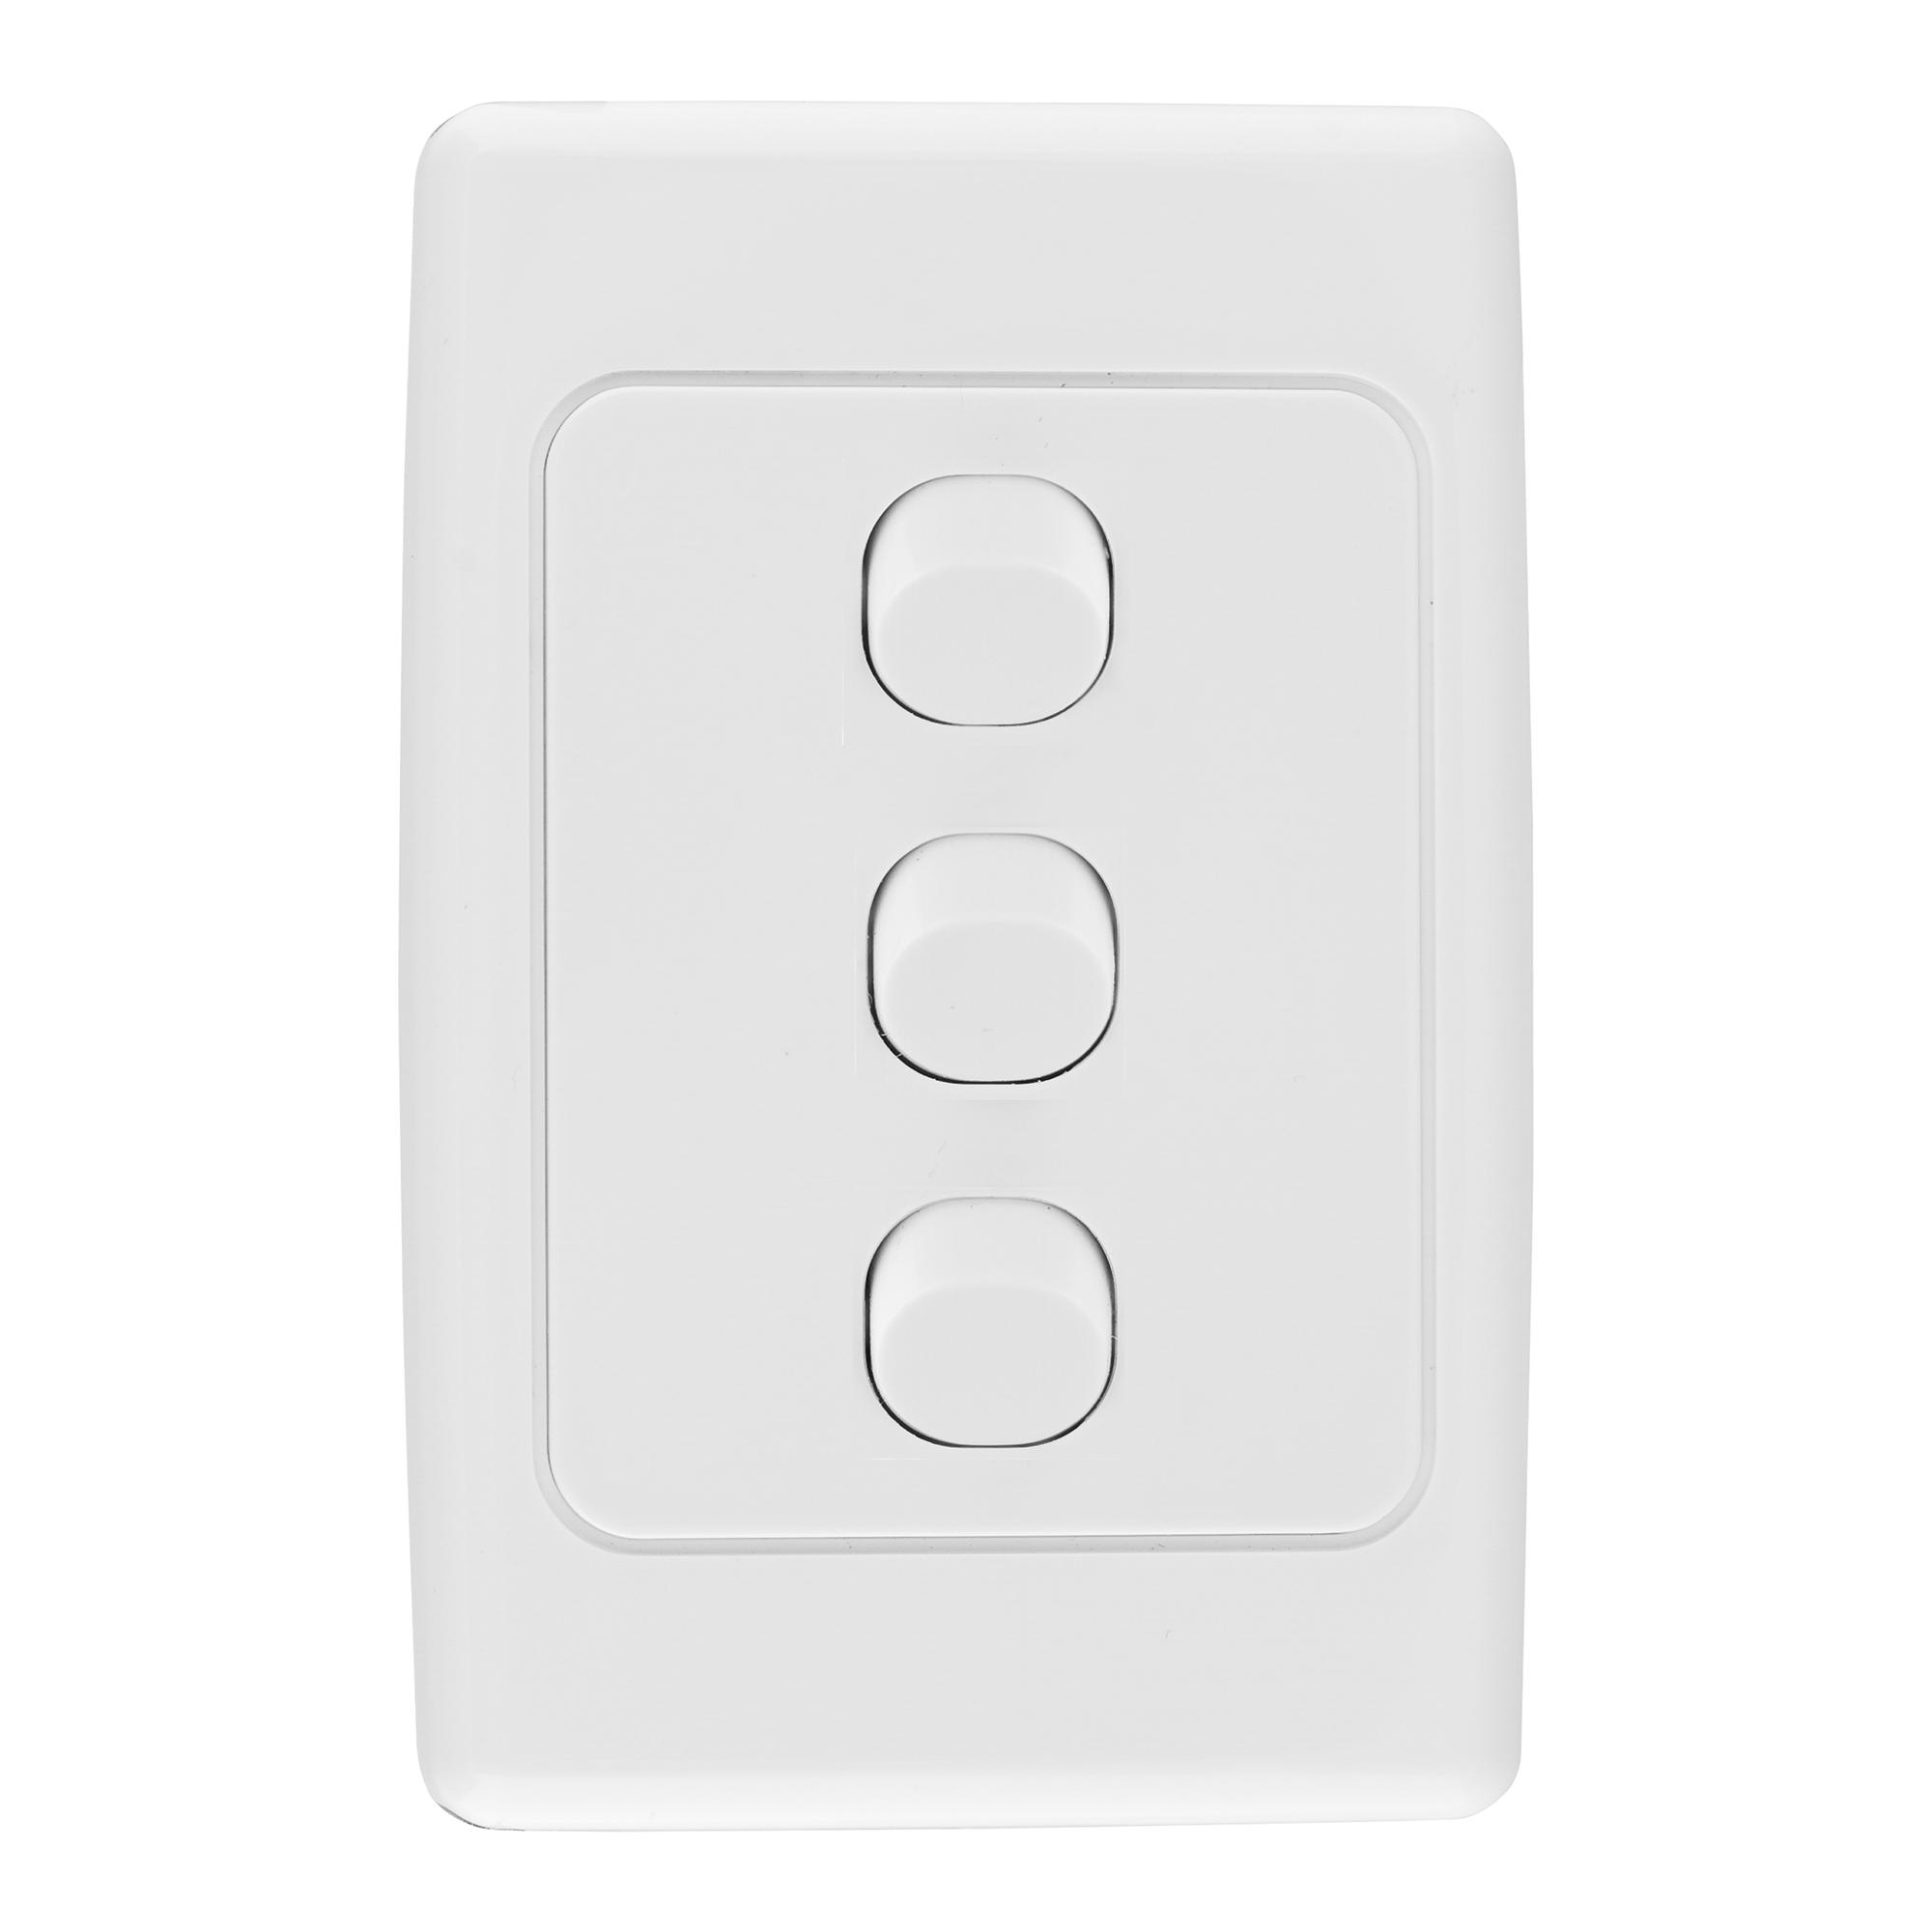 Deta triple vertical switch